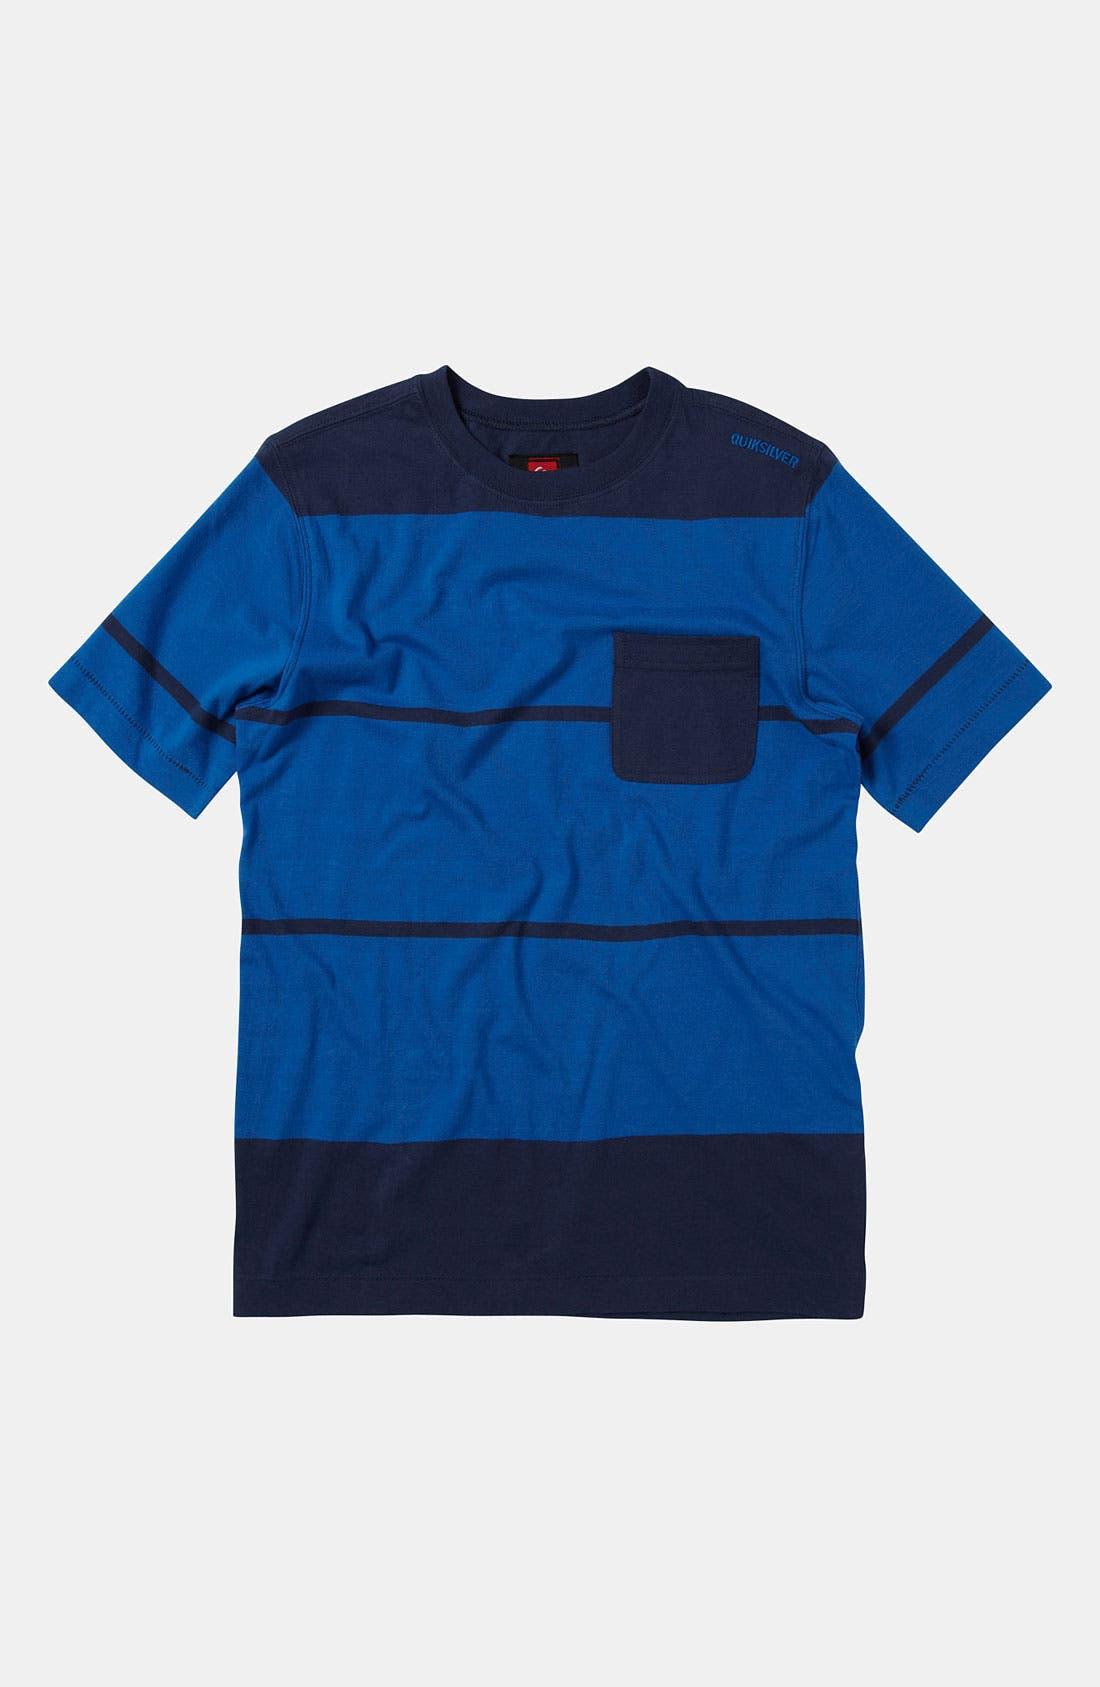 Alternate Image 1 Selected - Quiksilver 'Tenney' T-Shirt (Big Boys)